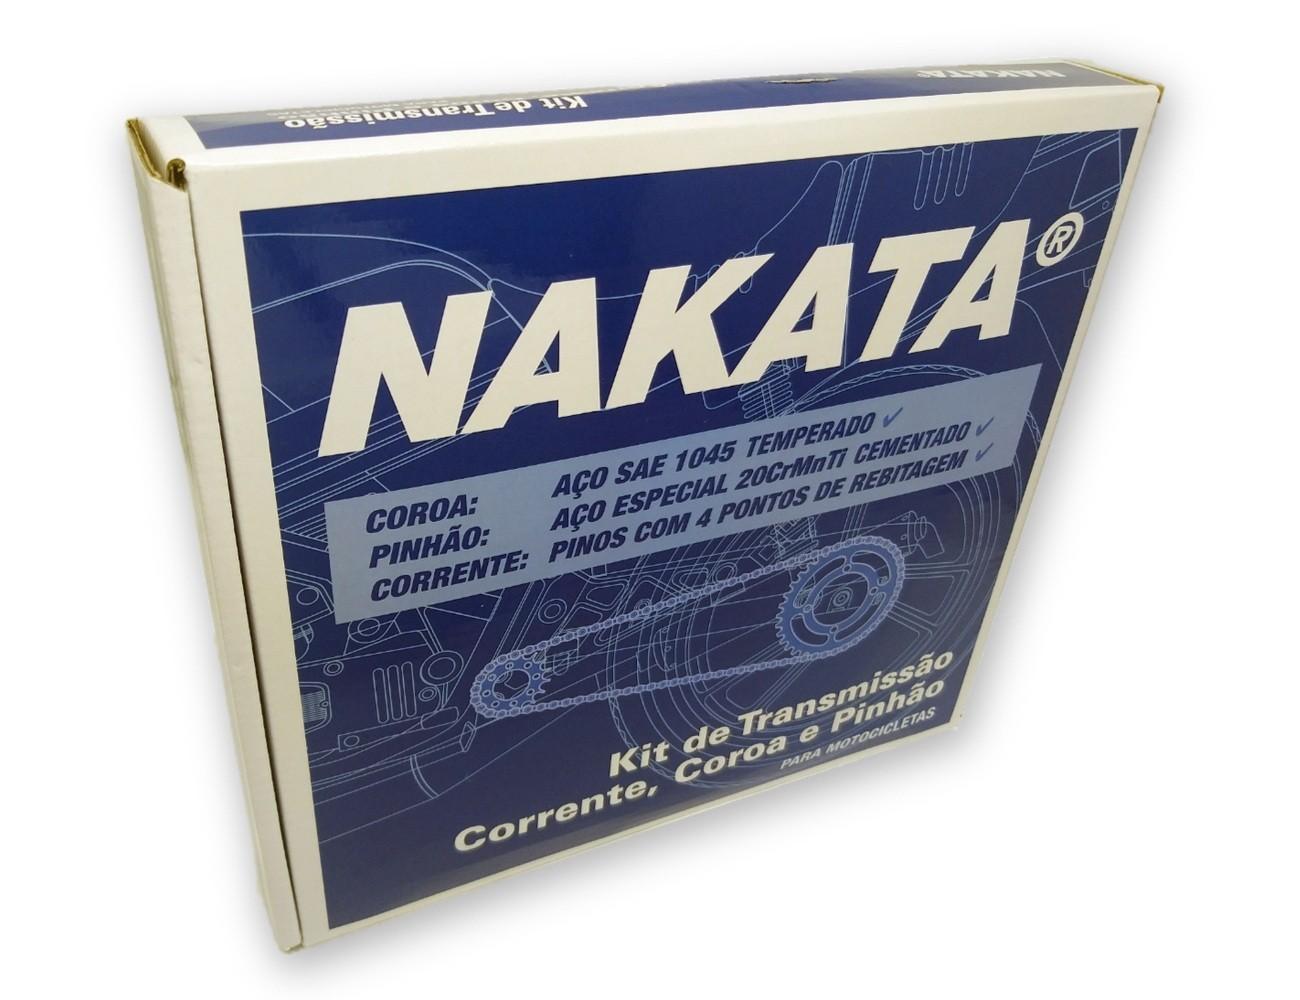 Kit Relação Twister 250 2001 a 2008 Aço 1045 Nakata 520x106x37x13